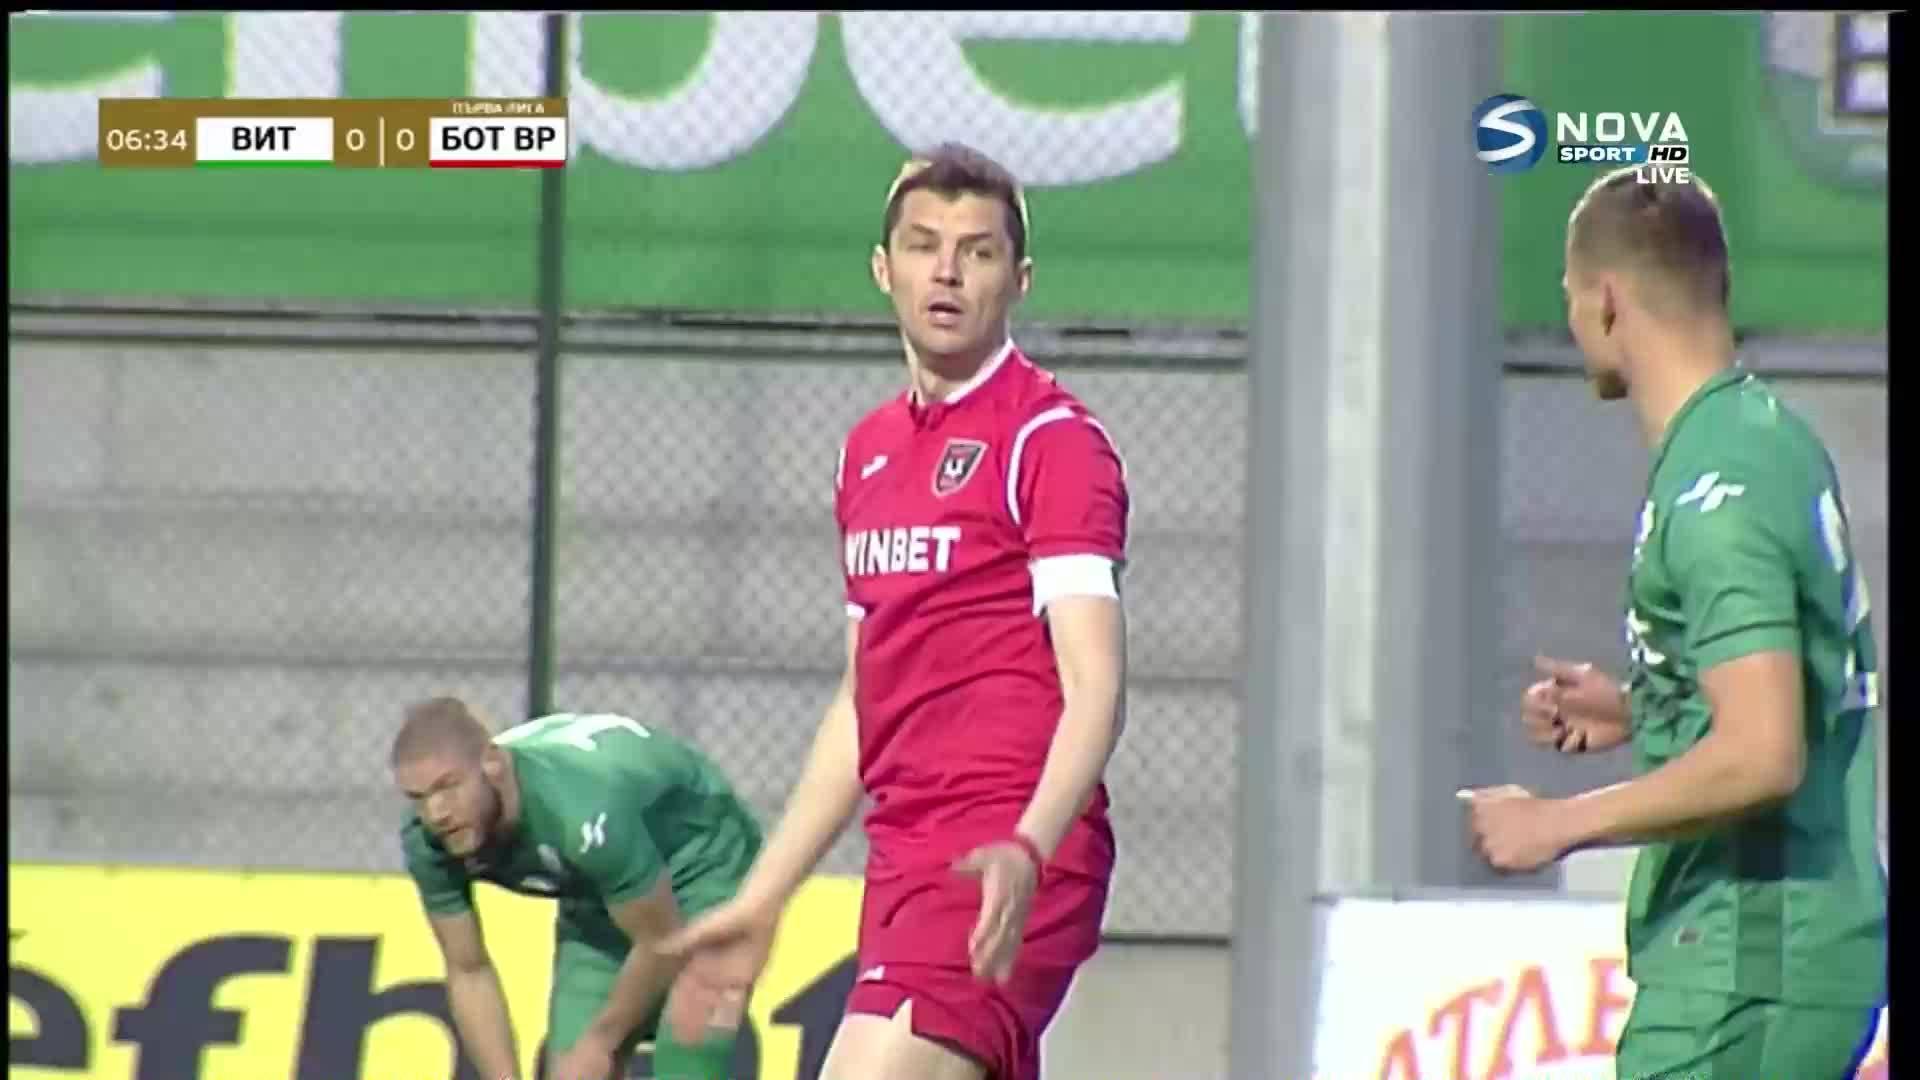 Втори гол за Ботев Вр, втори на Домо, втори отменен